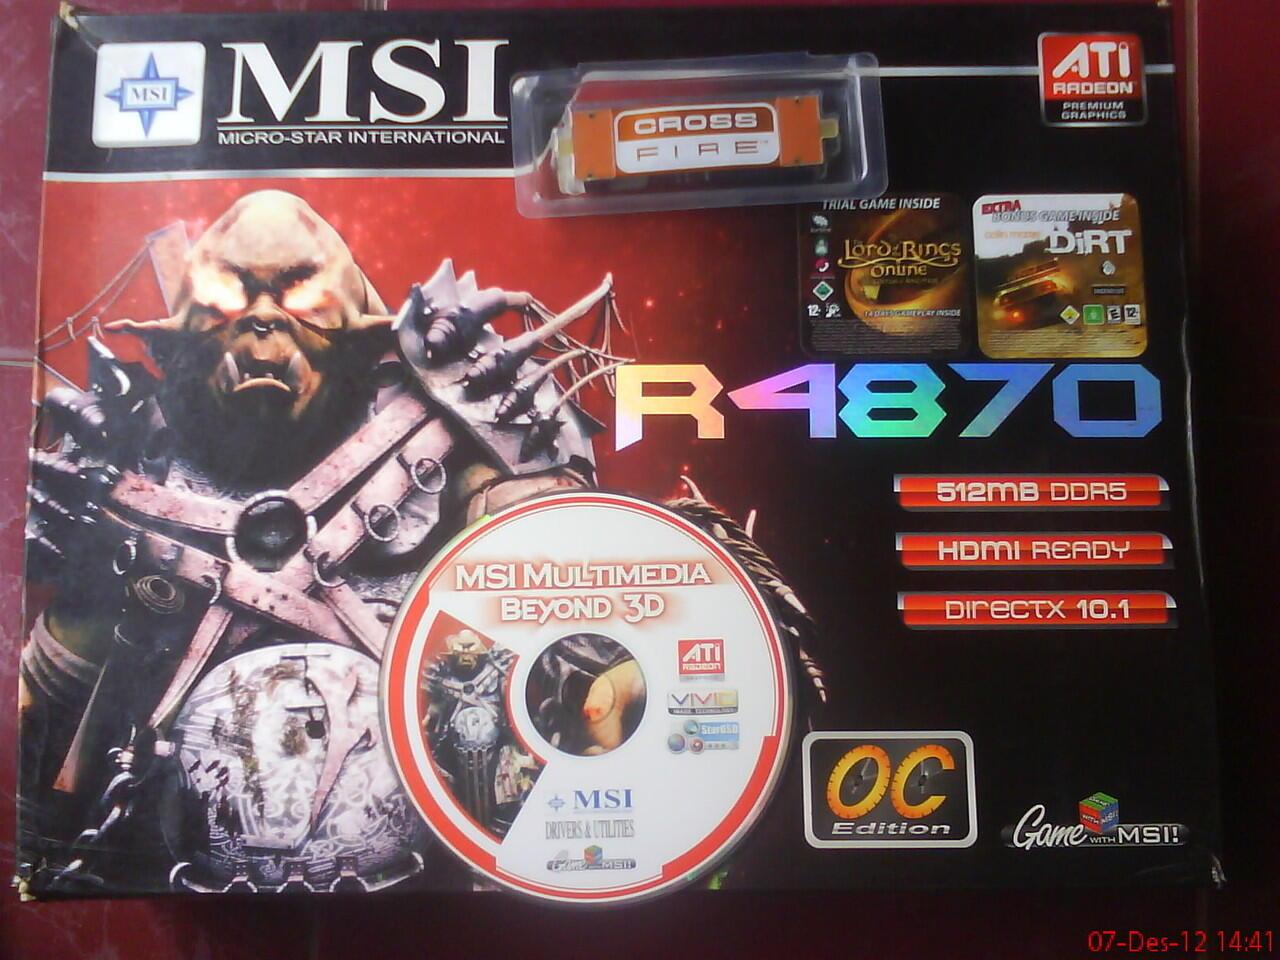 Di Jual VGA/GPU ATI Radeon R4870 T2D512